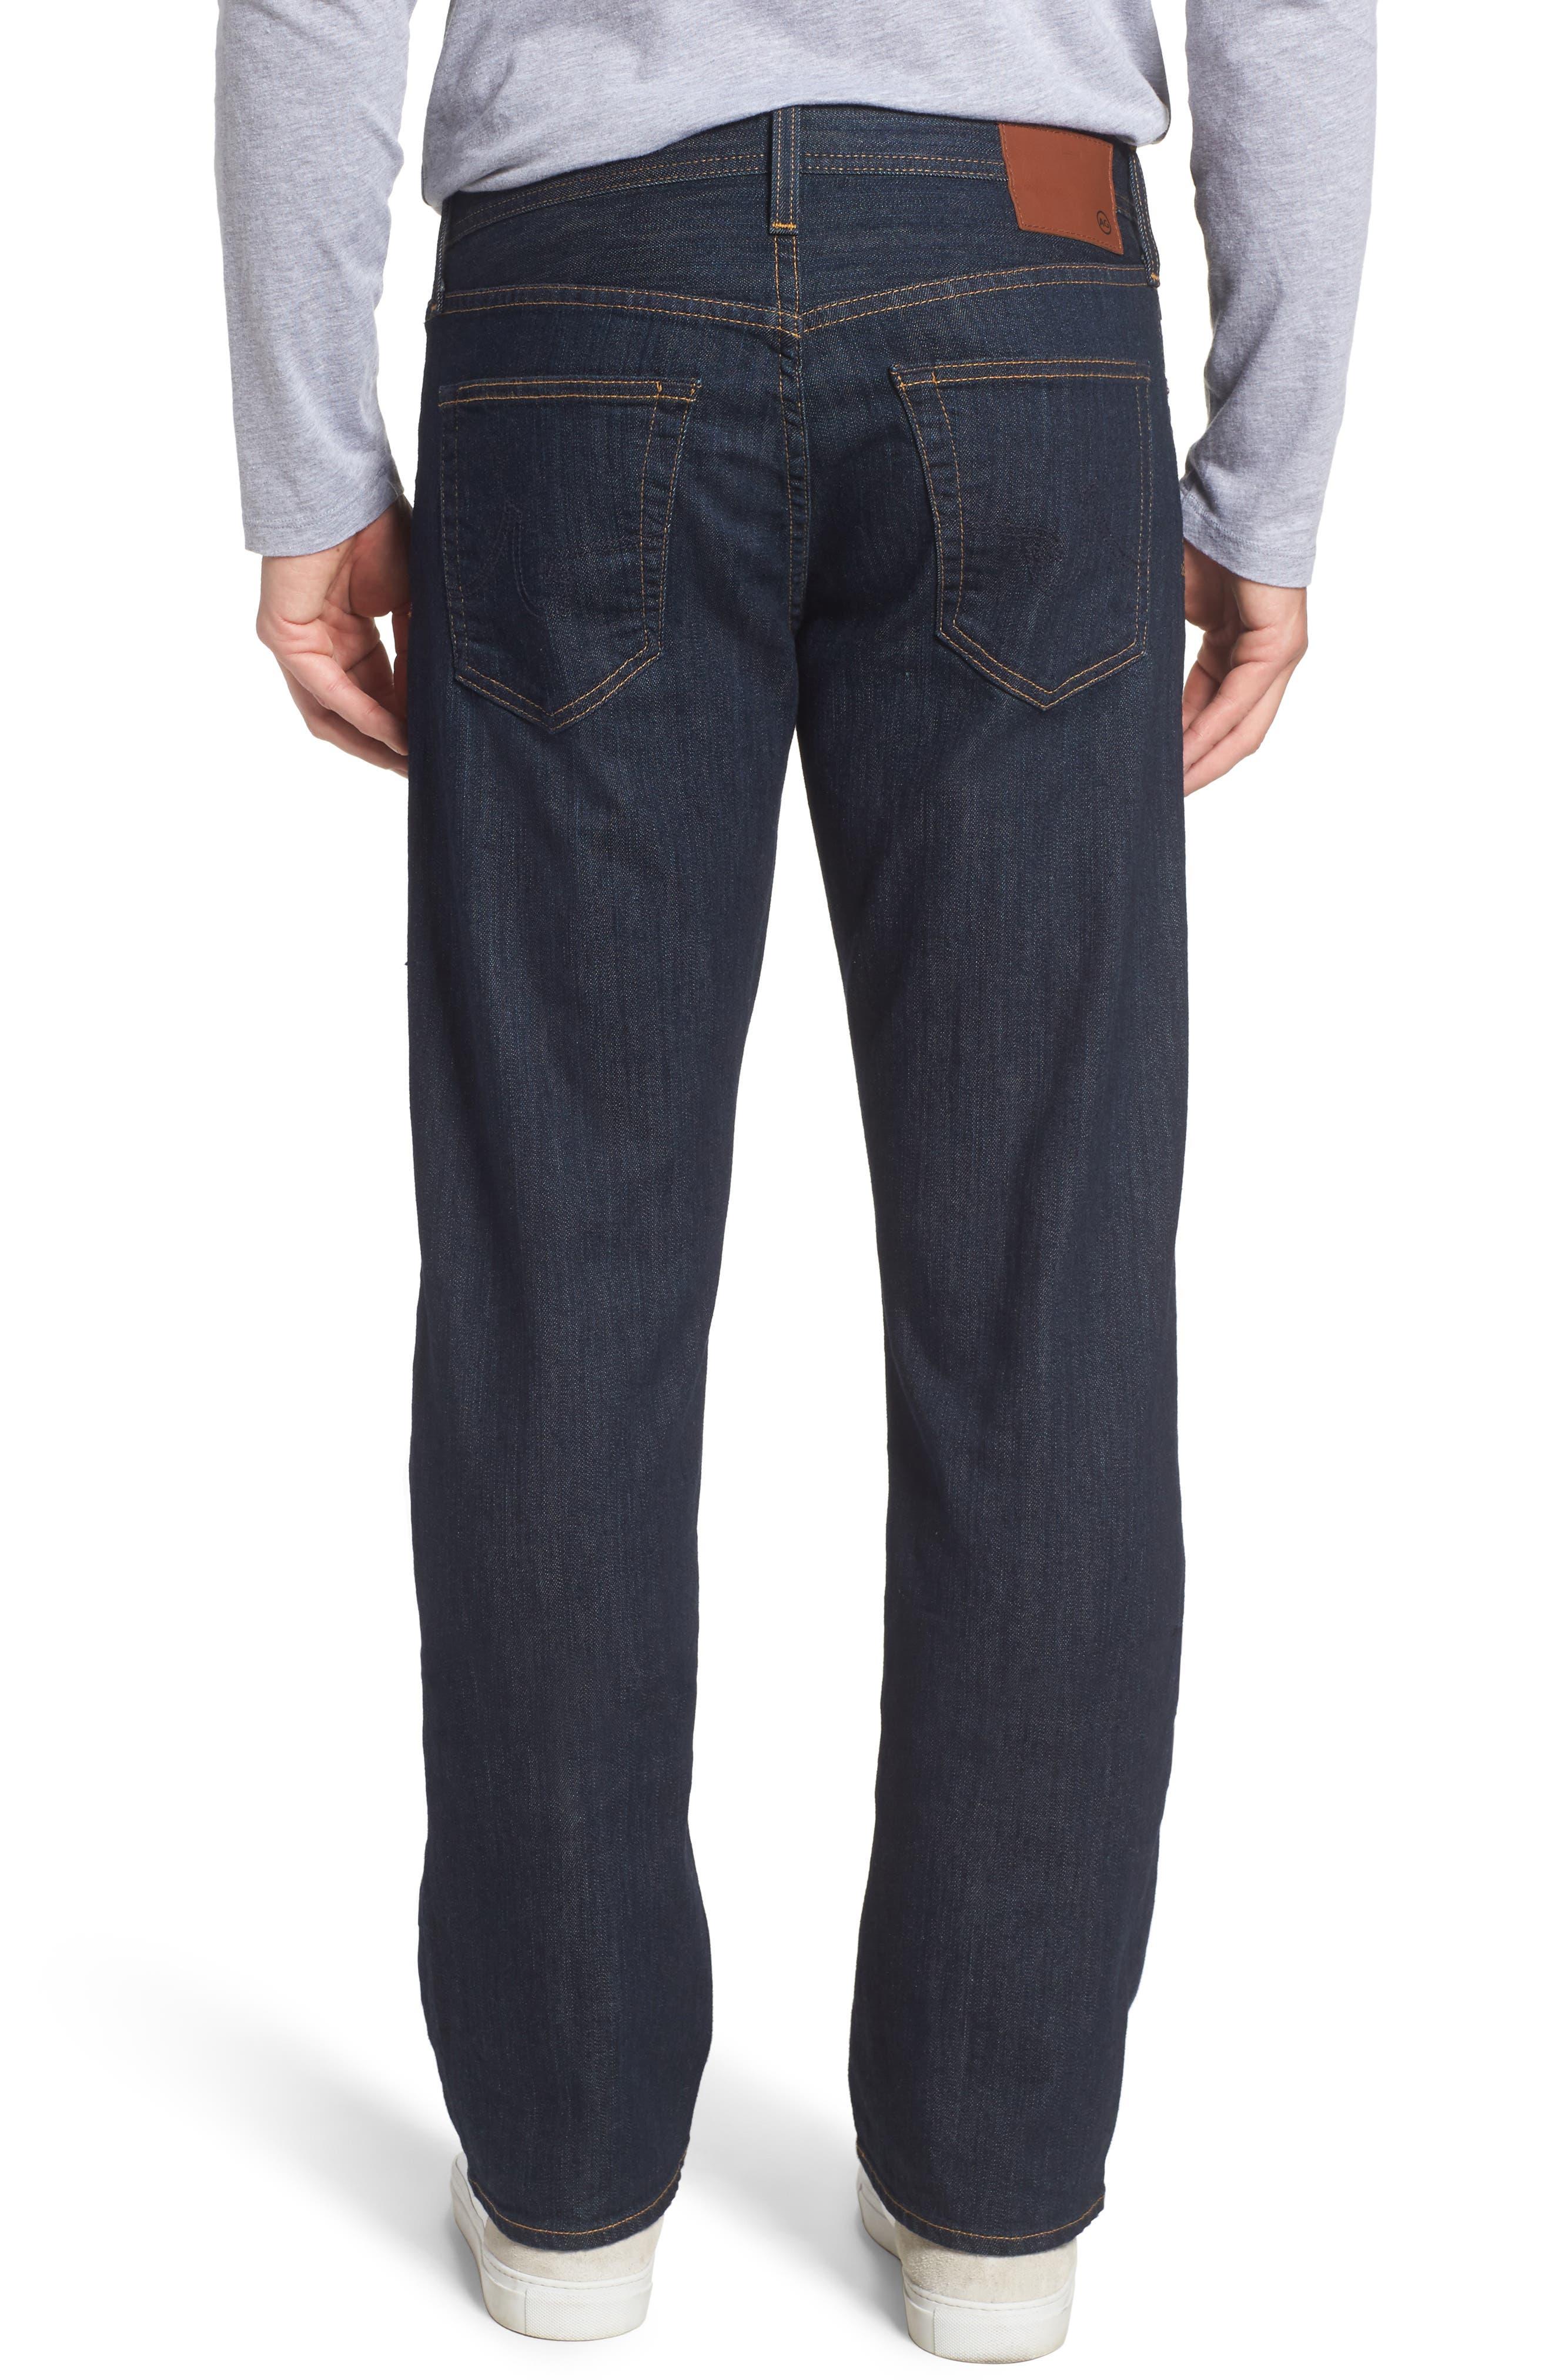 'Protégé' Straight Leg Jeans,                             Alternate thumbnail 2, color,                             016